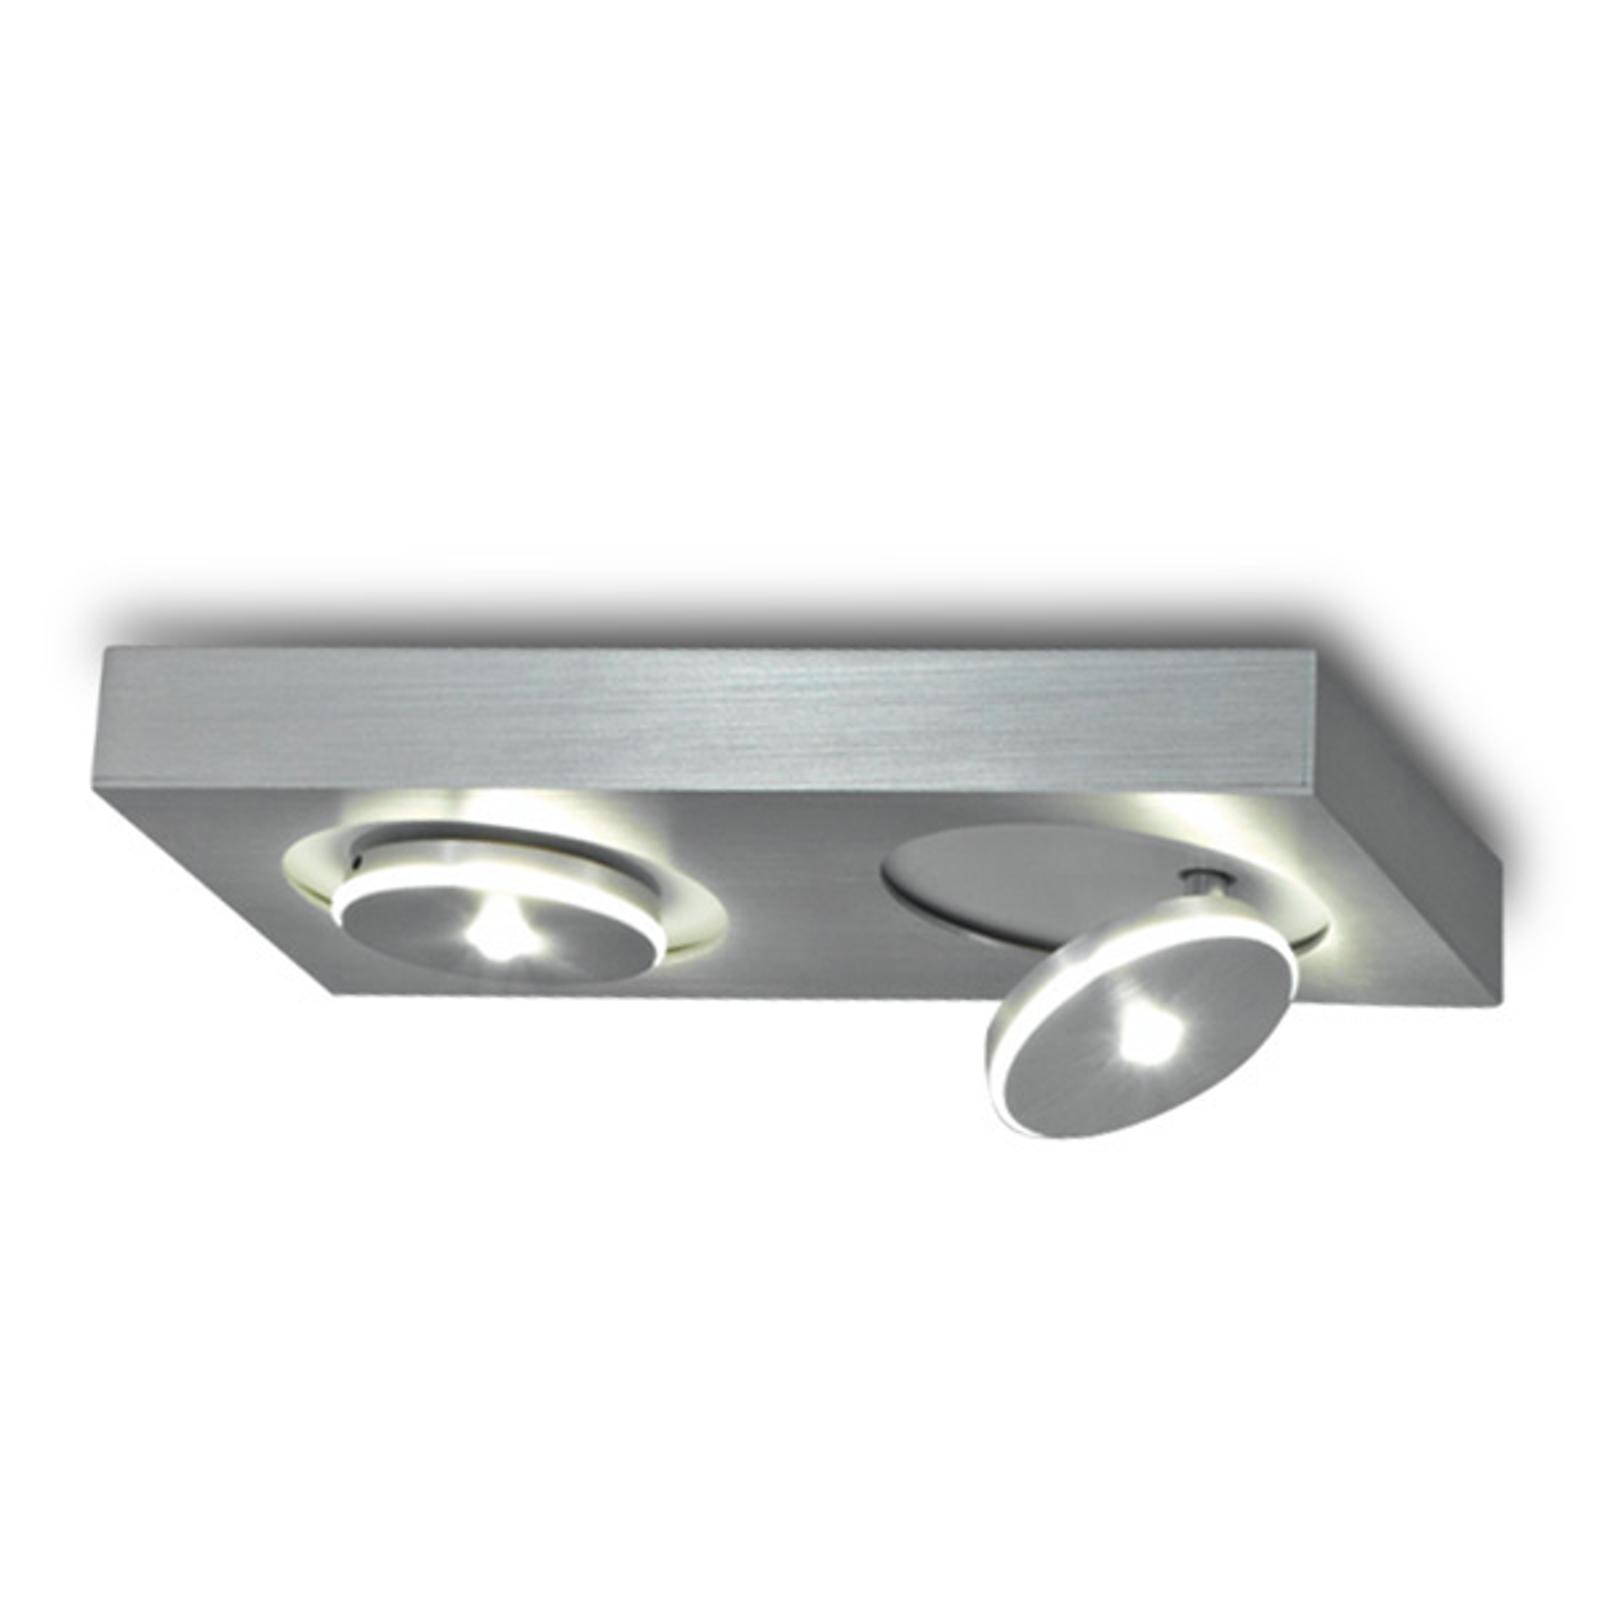 Escale Spot It – moderné stropné LED svietidlo 2pl_3051072_1